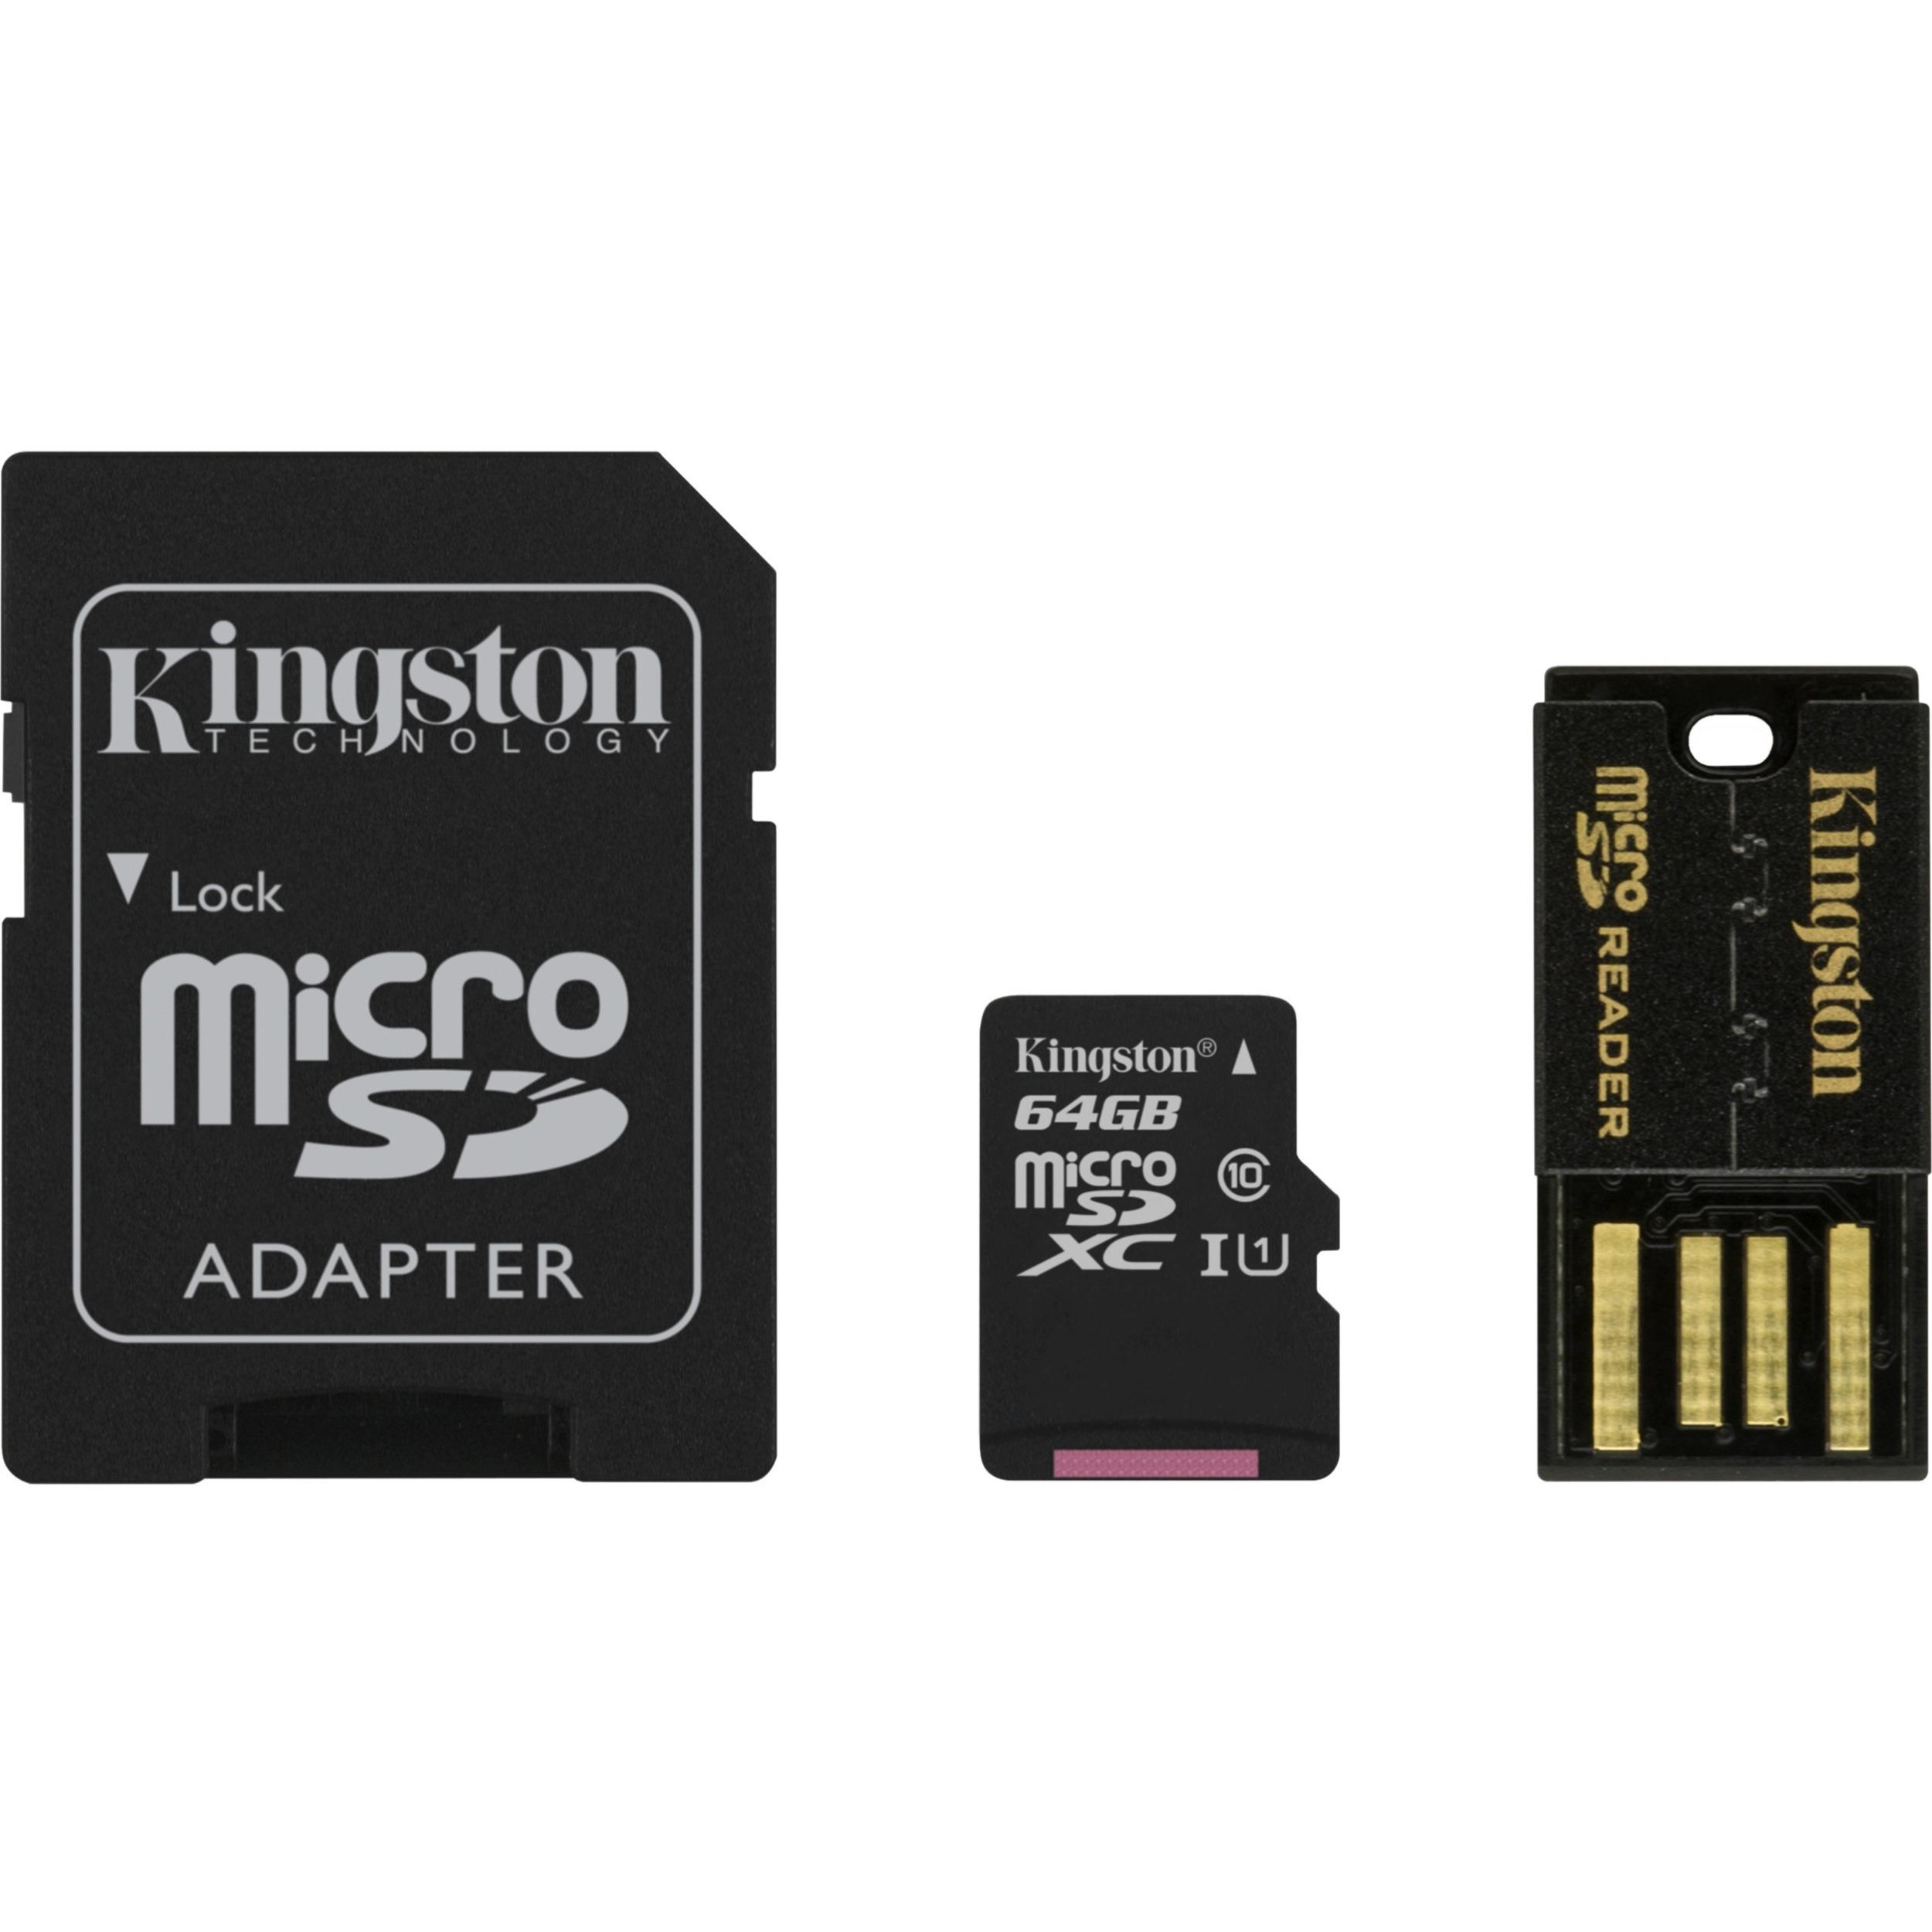 Kingston 64 GB microSDXC - Class 10/UHS-I - 1 Card